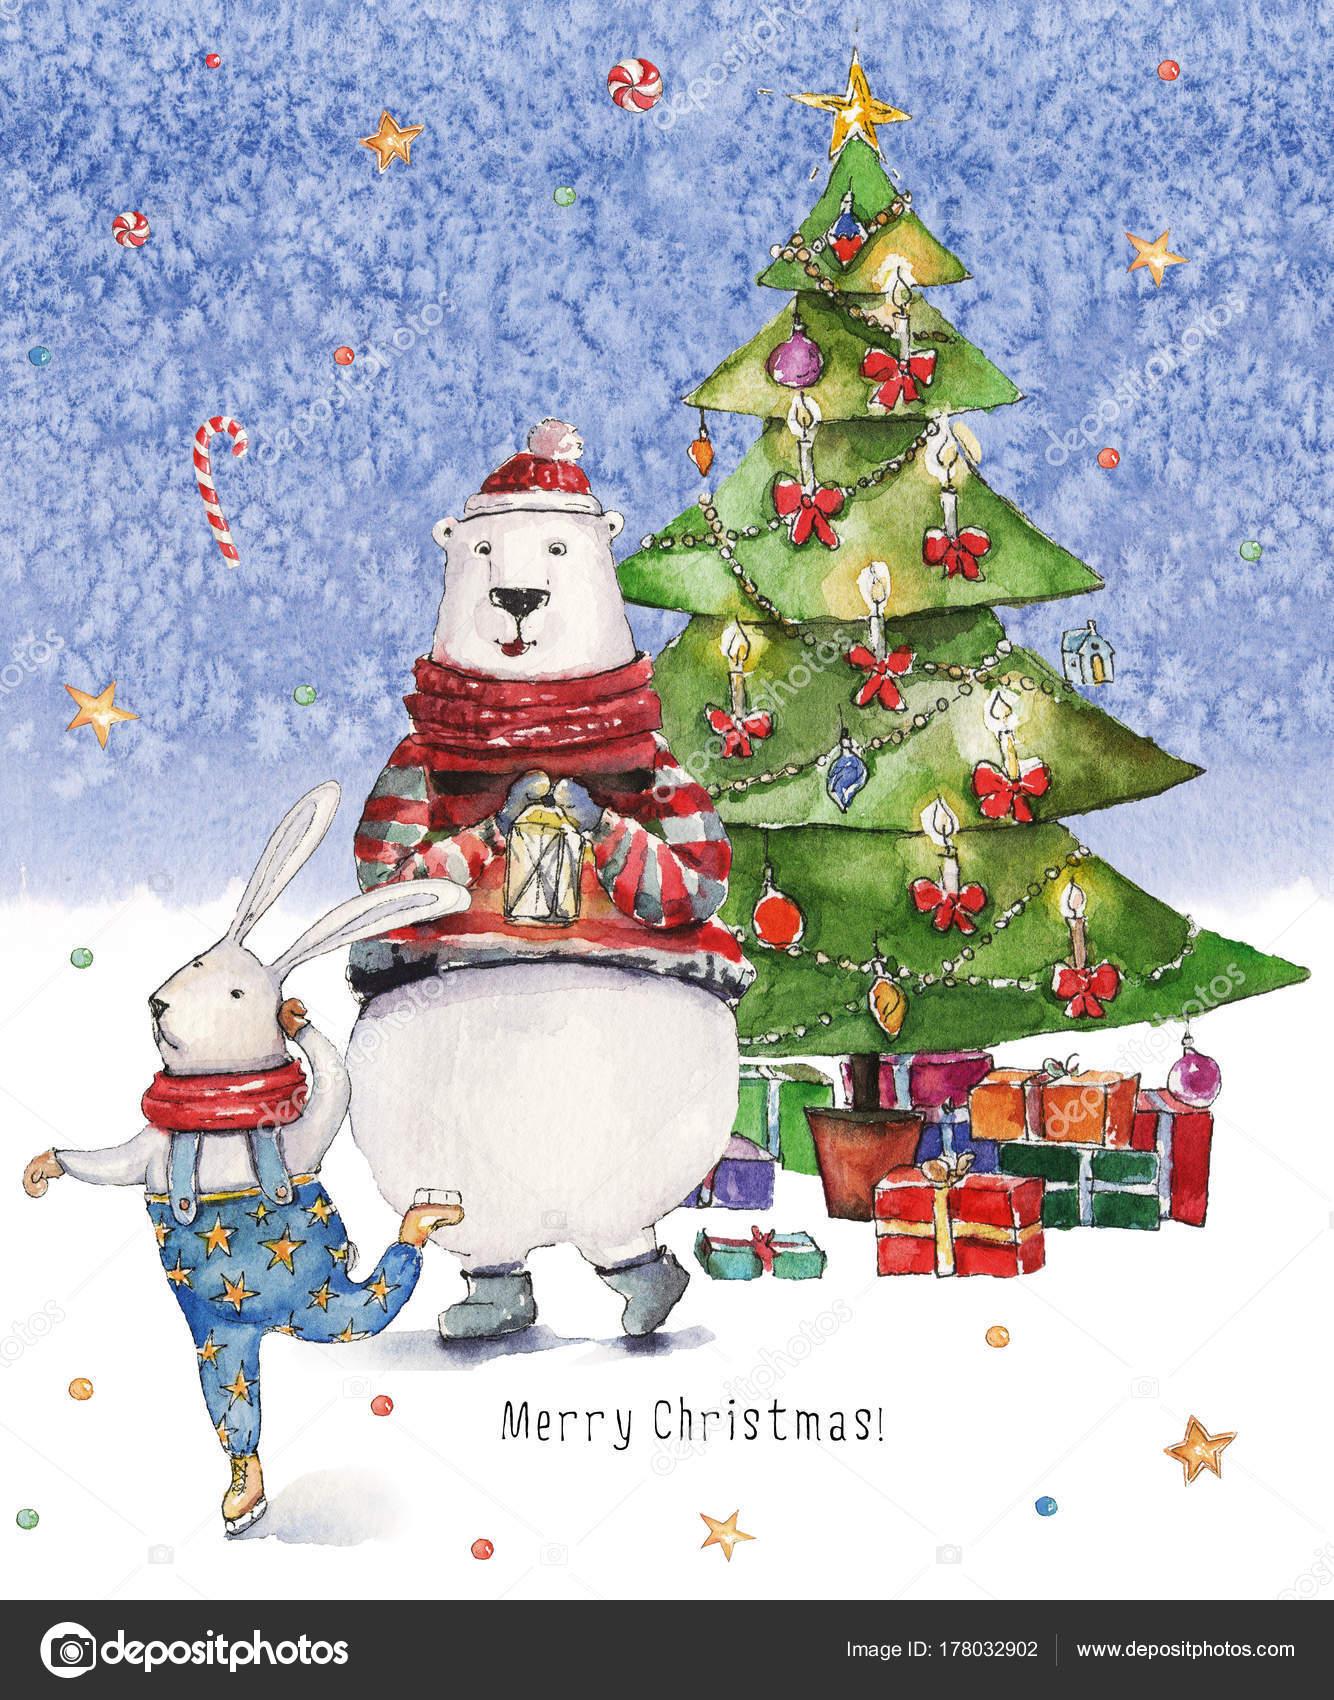 Watercolor Christmas Illustration Christmas Tree Presents Colorful ...